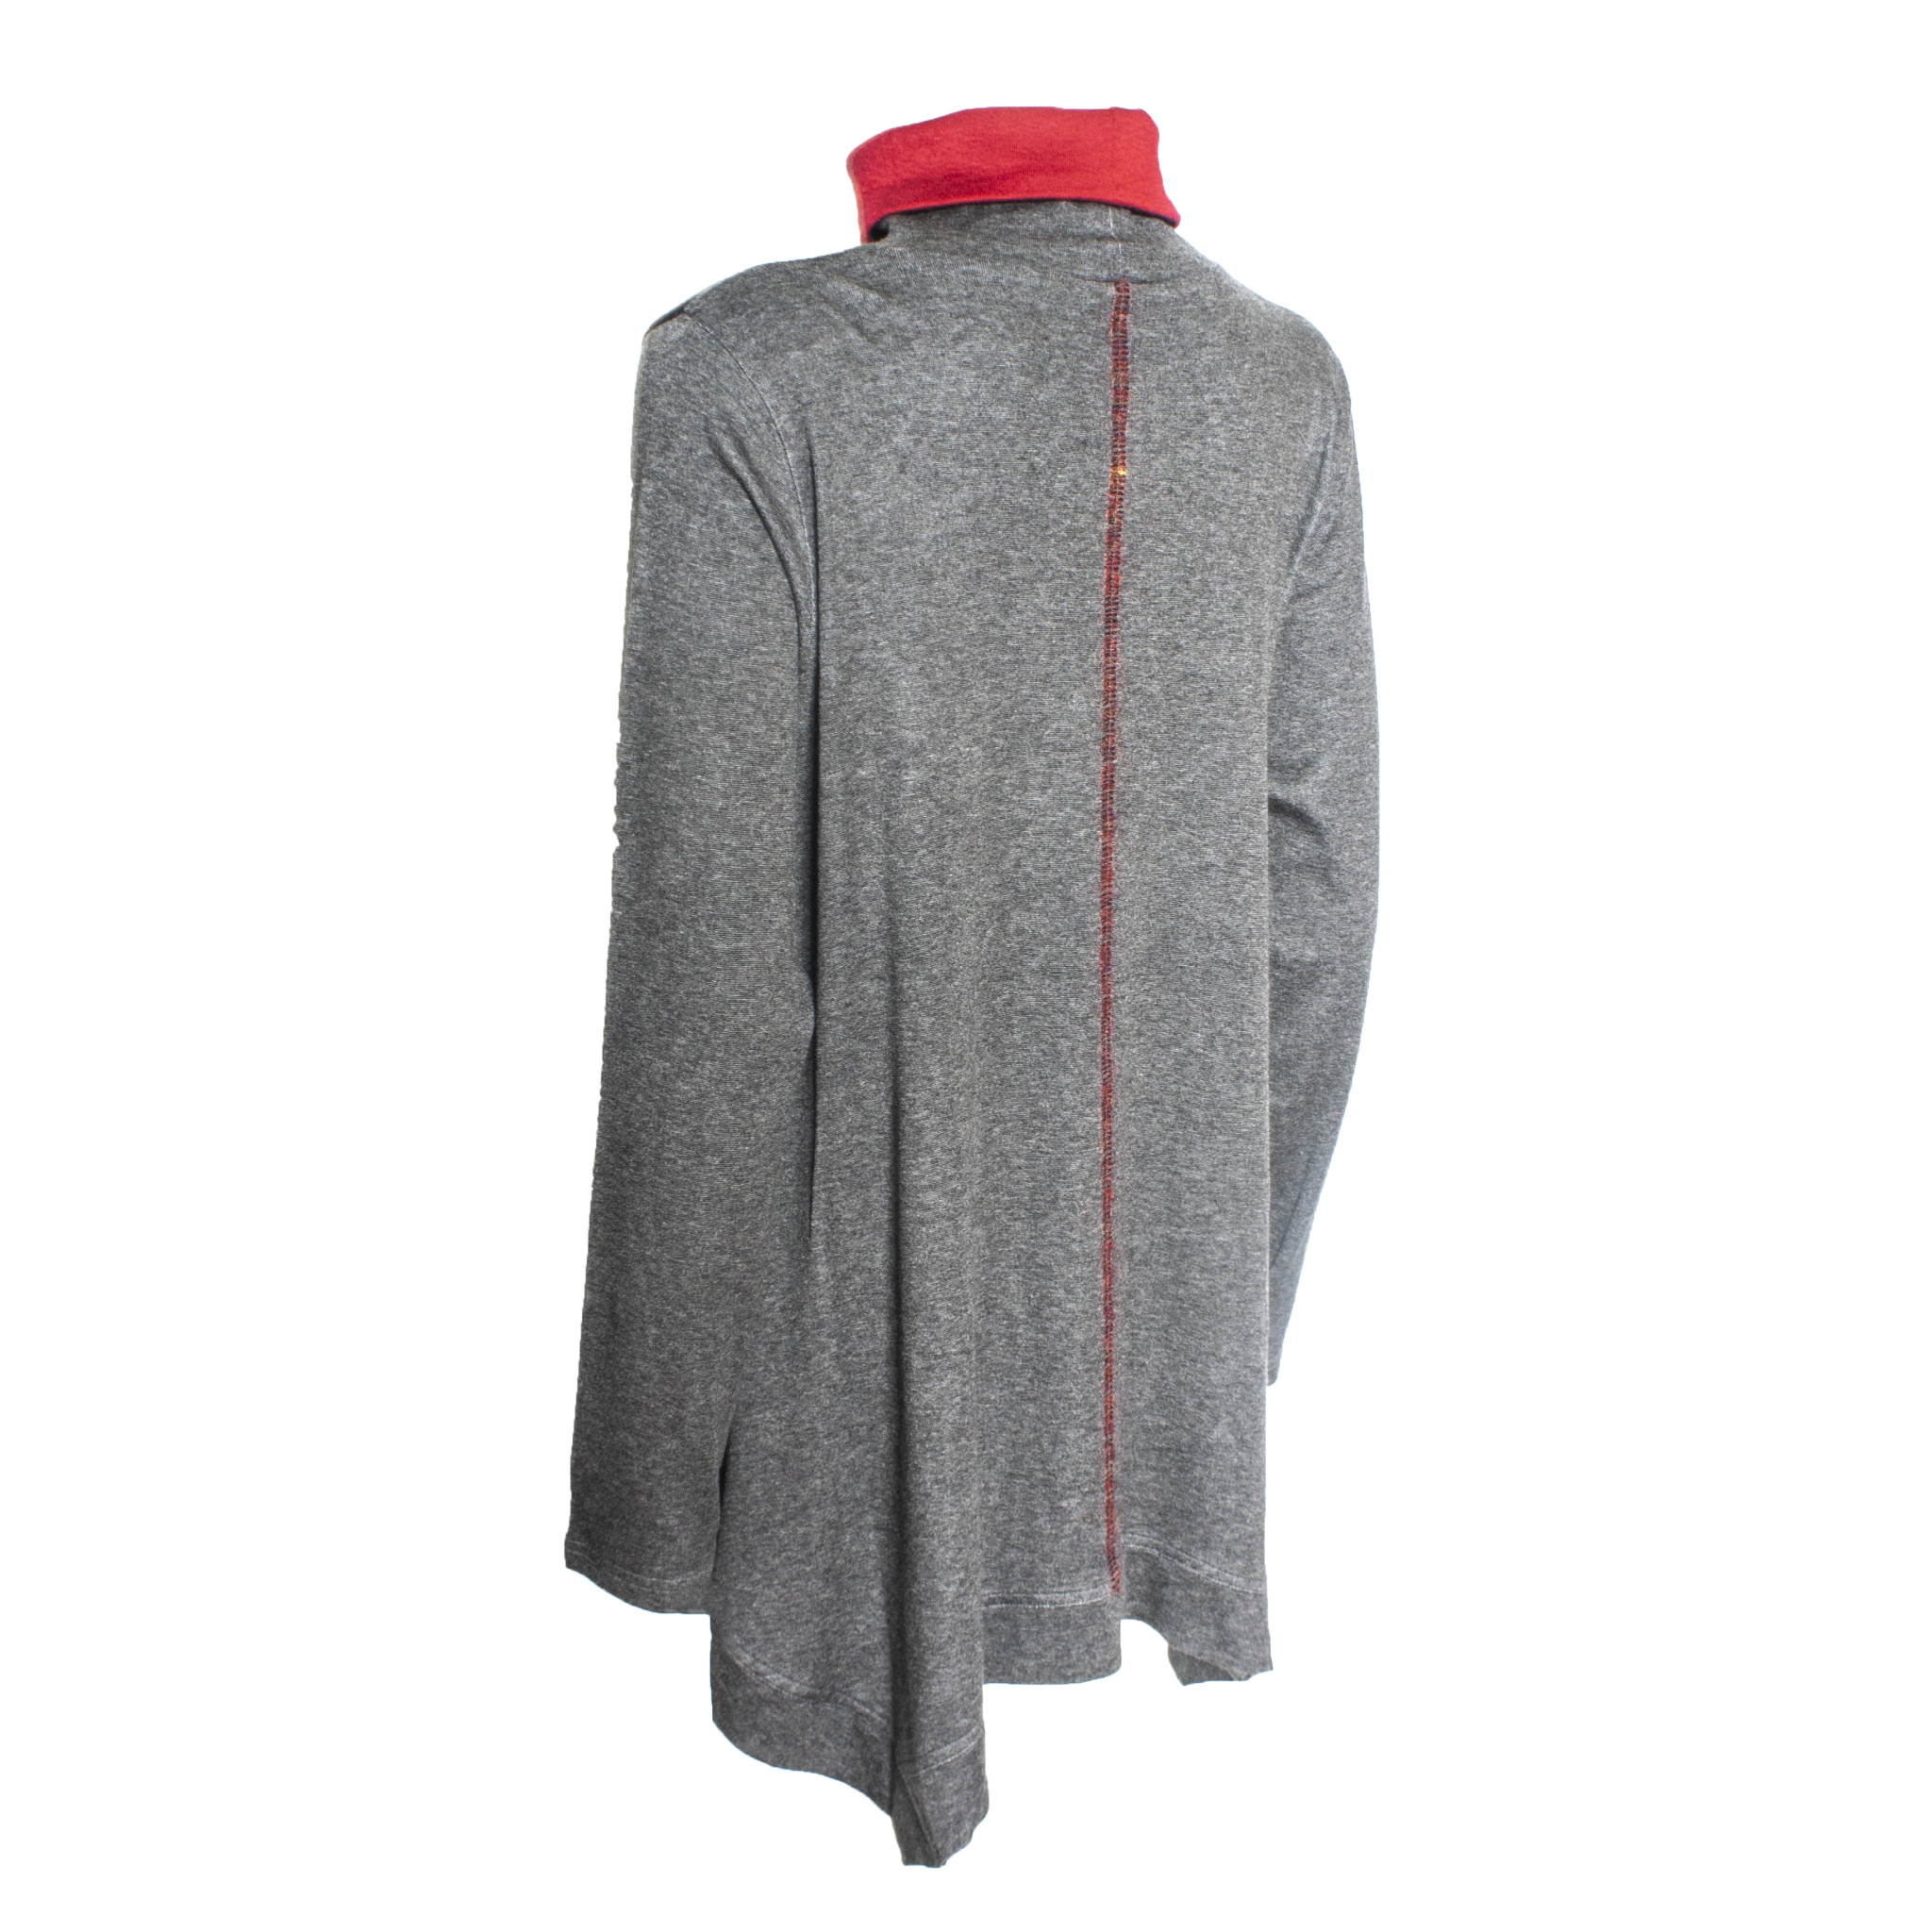 Yoshi Yoshi Yoshi Yoshi Dyed Print Pullover - Grey/Red